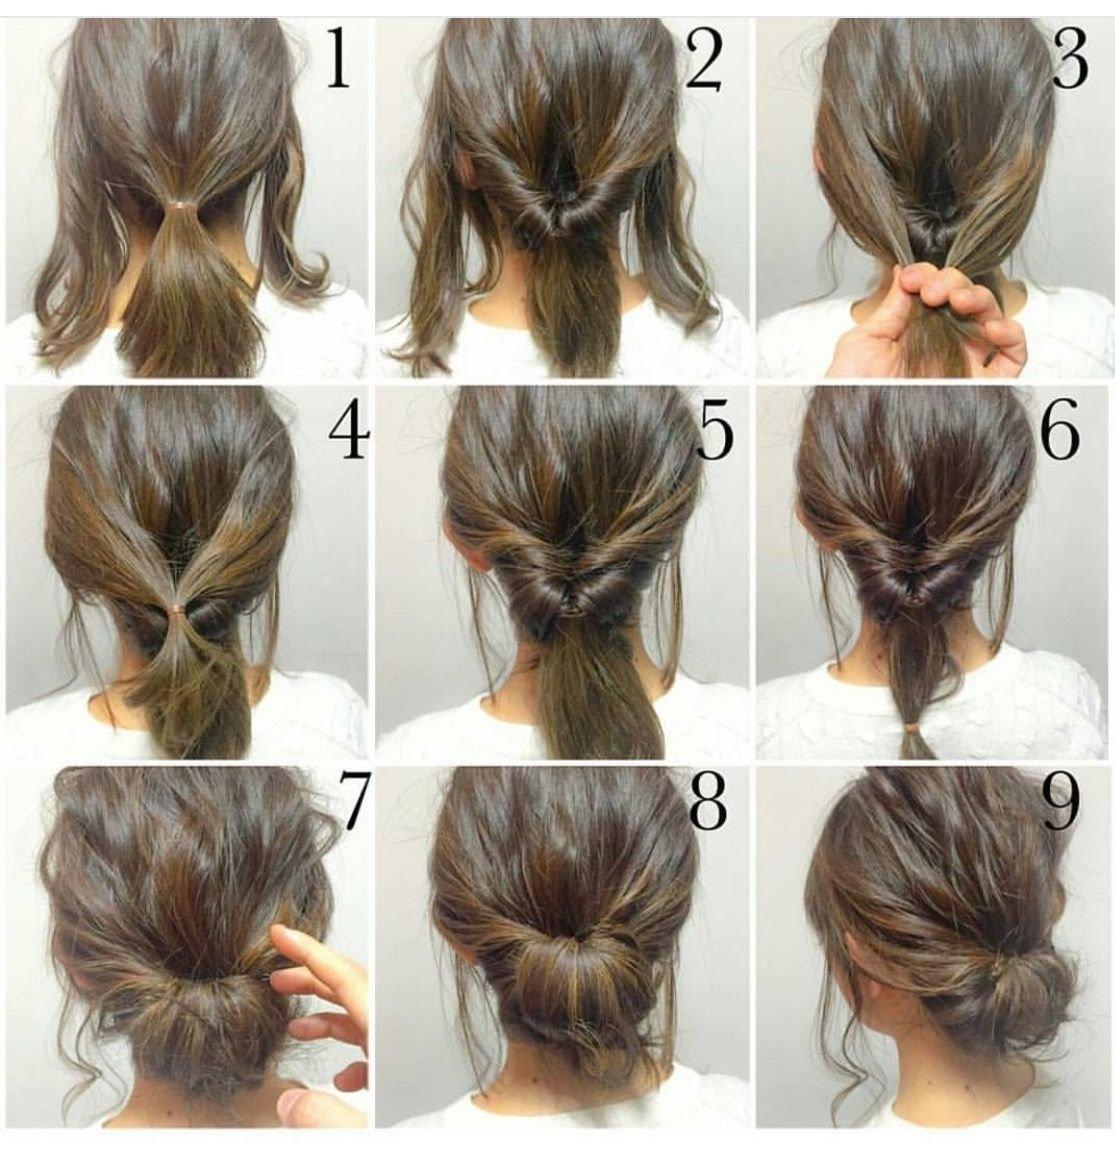 10 Stunning Easy Hair Ideas For Long Hair 4 messy updos for long hair hairz pinterest updos hair style 1 2021